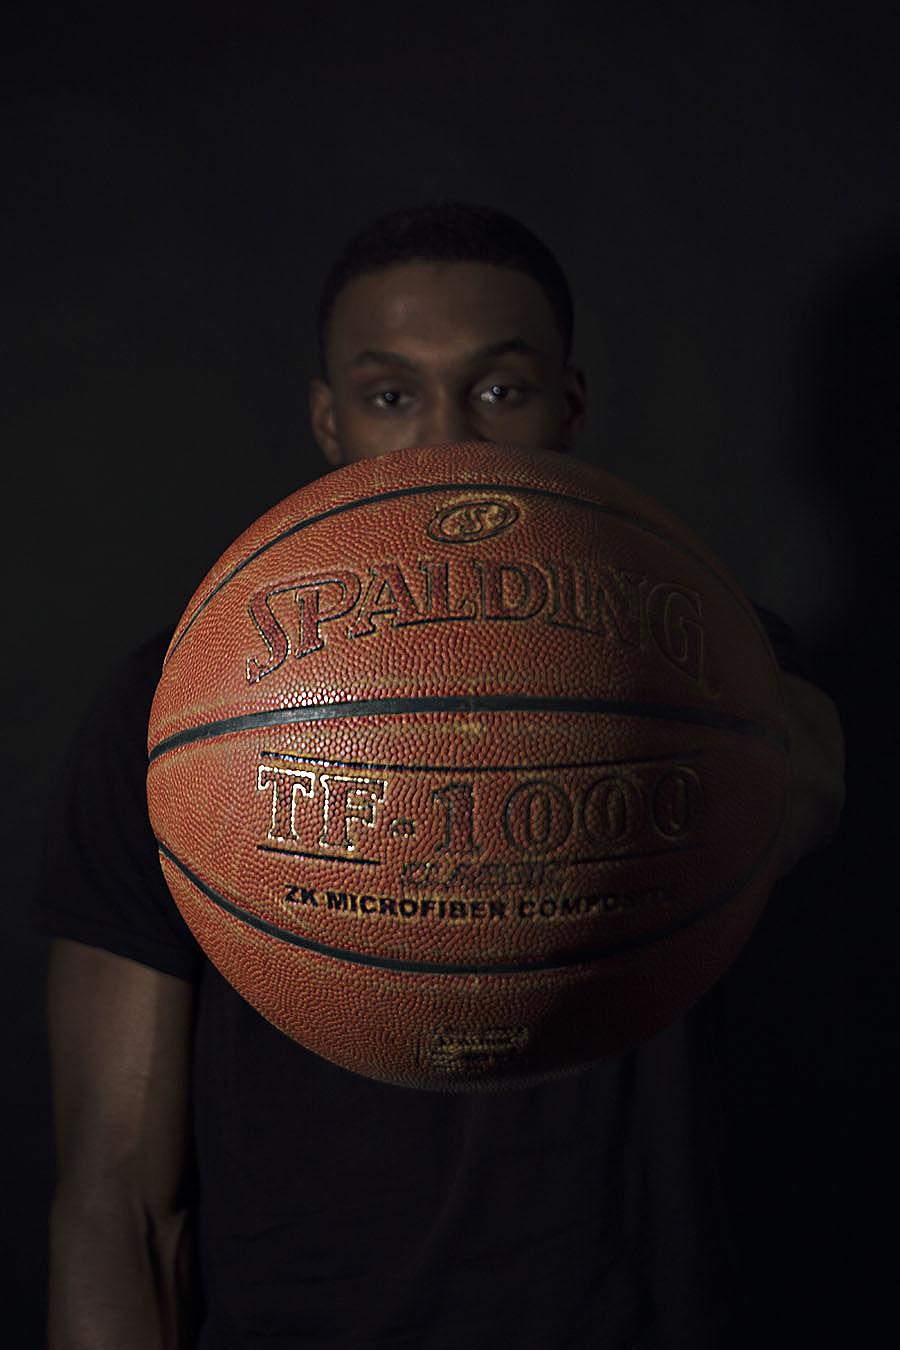 Soraya_Hebron_photography_tony_Hicks_portraiture_black_male_ivy_league_atheletes_basketball_players_fearless_back_muscular_spalding_ballers